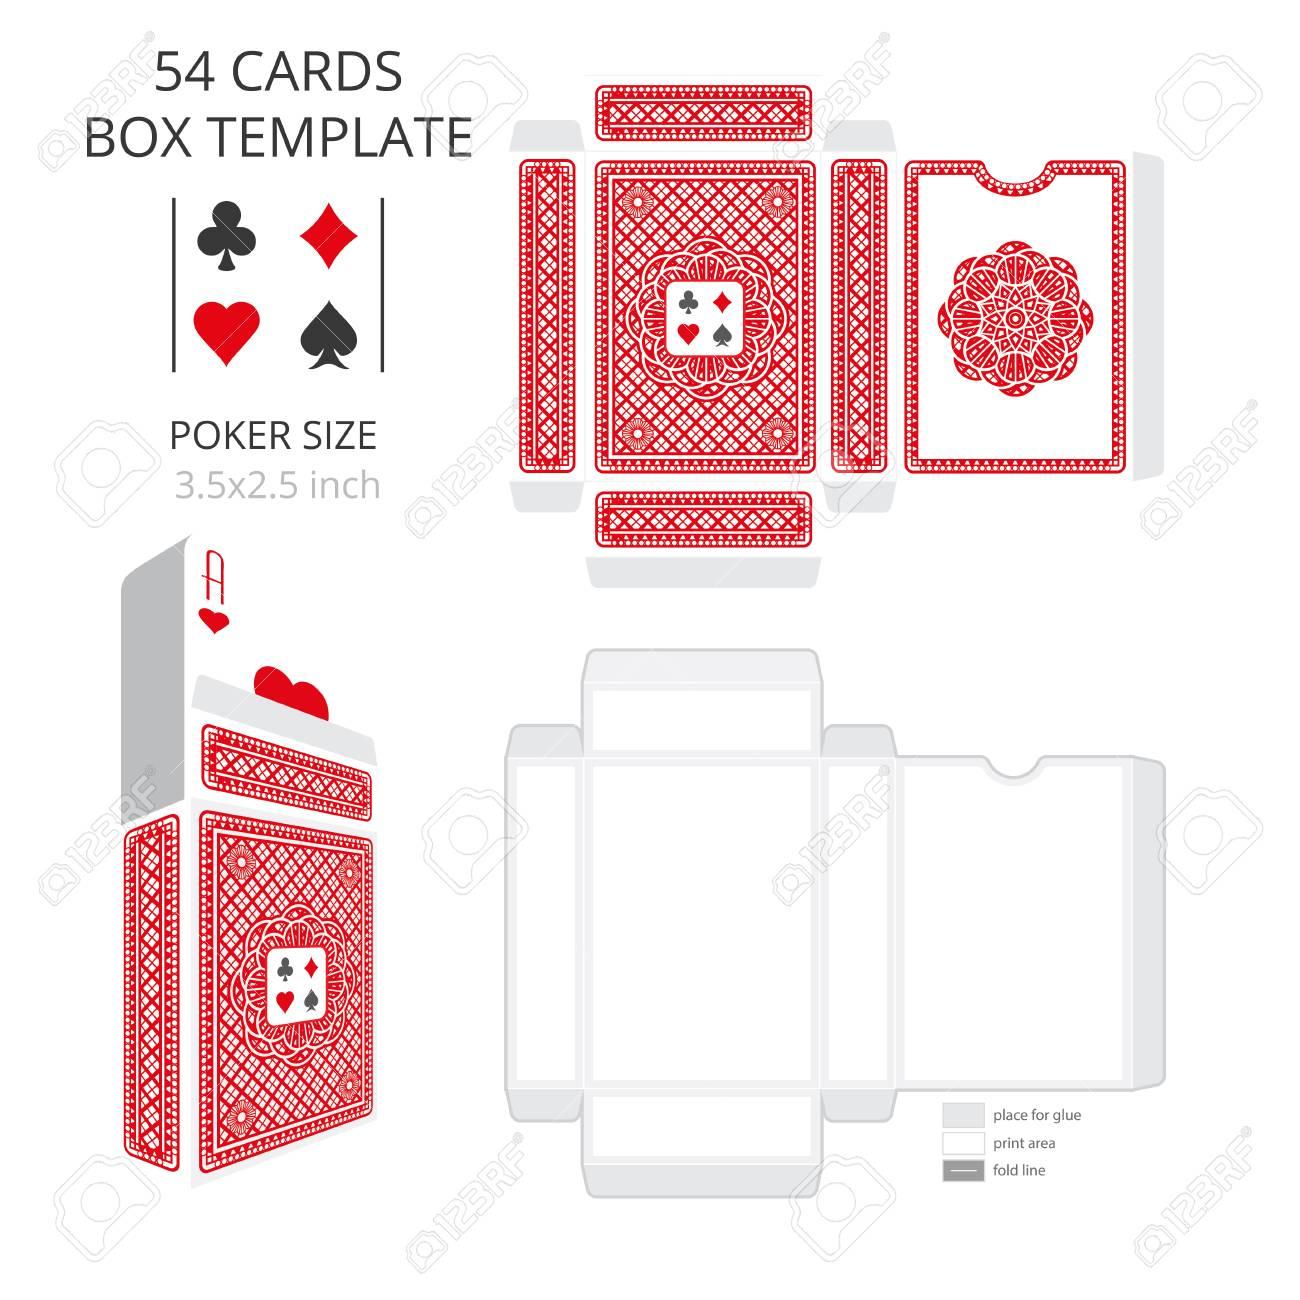 Poker Card Size Tuck Box Templatector Illustration Ready Design